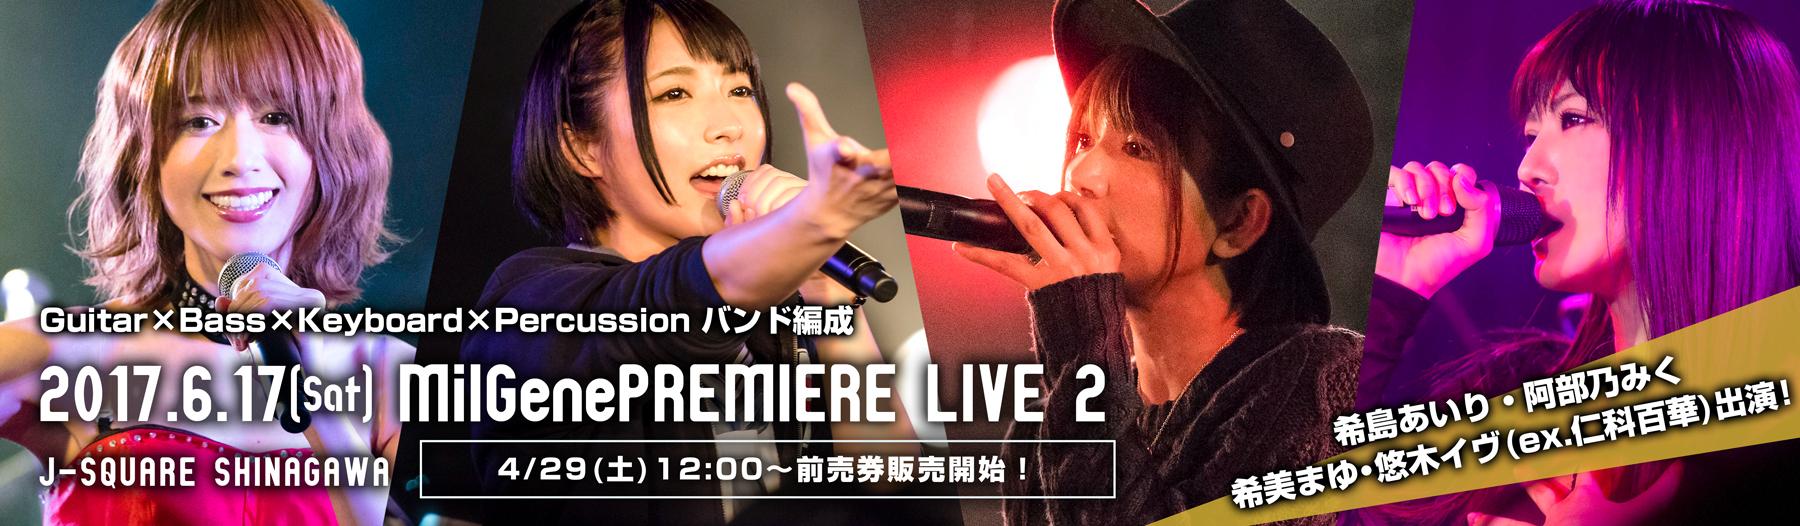 MilGene Premium Live 2(ミルジェネプレミアムライブツー)